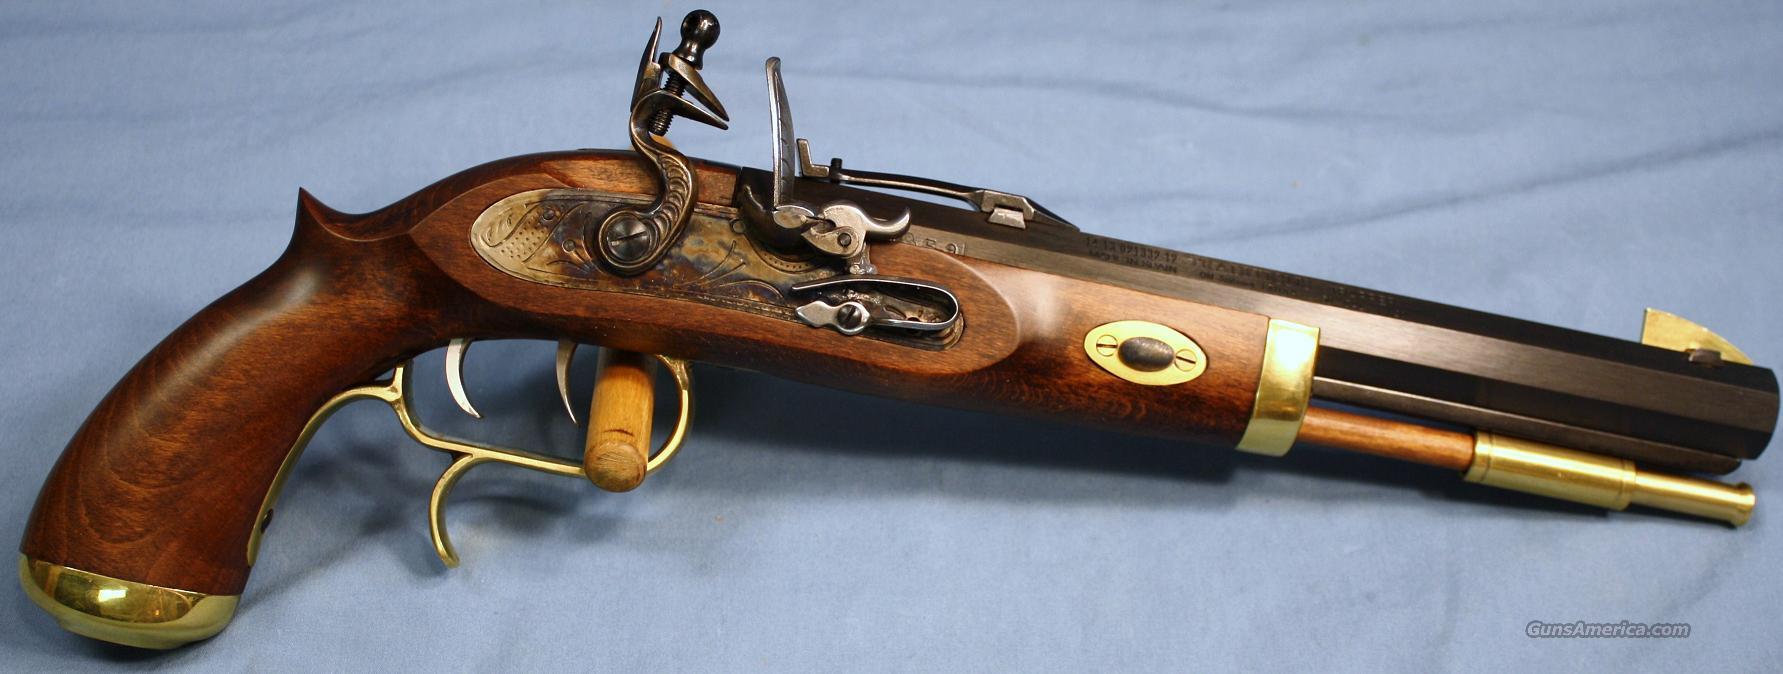 Traditions Trapper Single Shot Flintlock Pistol  50 Caliber